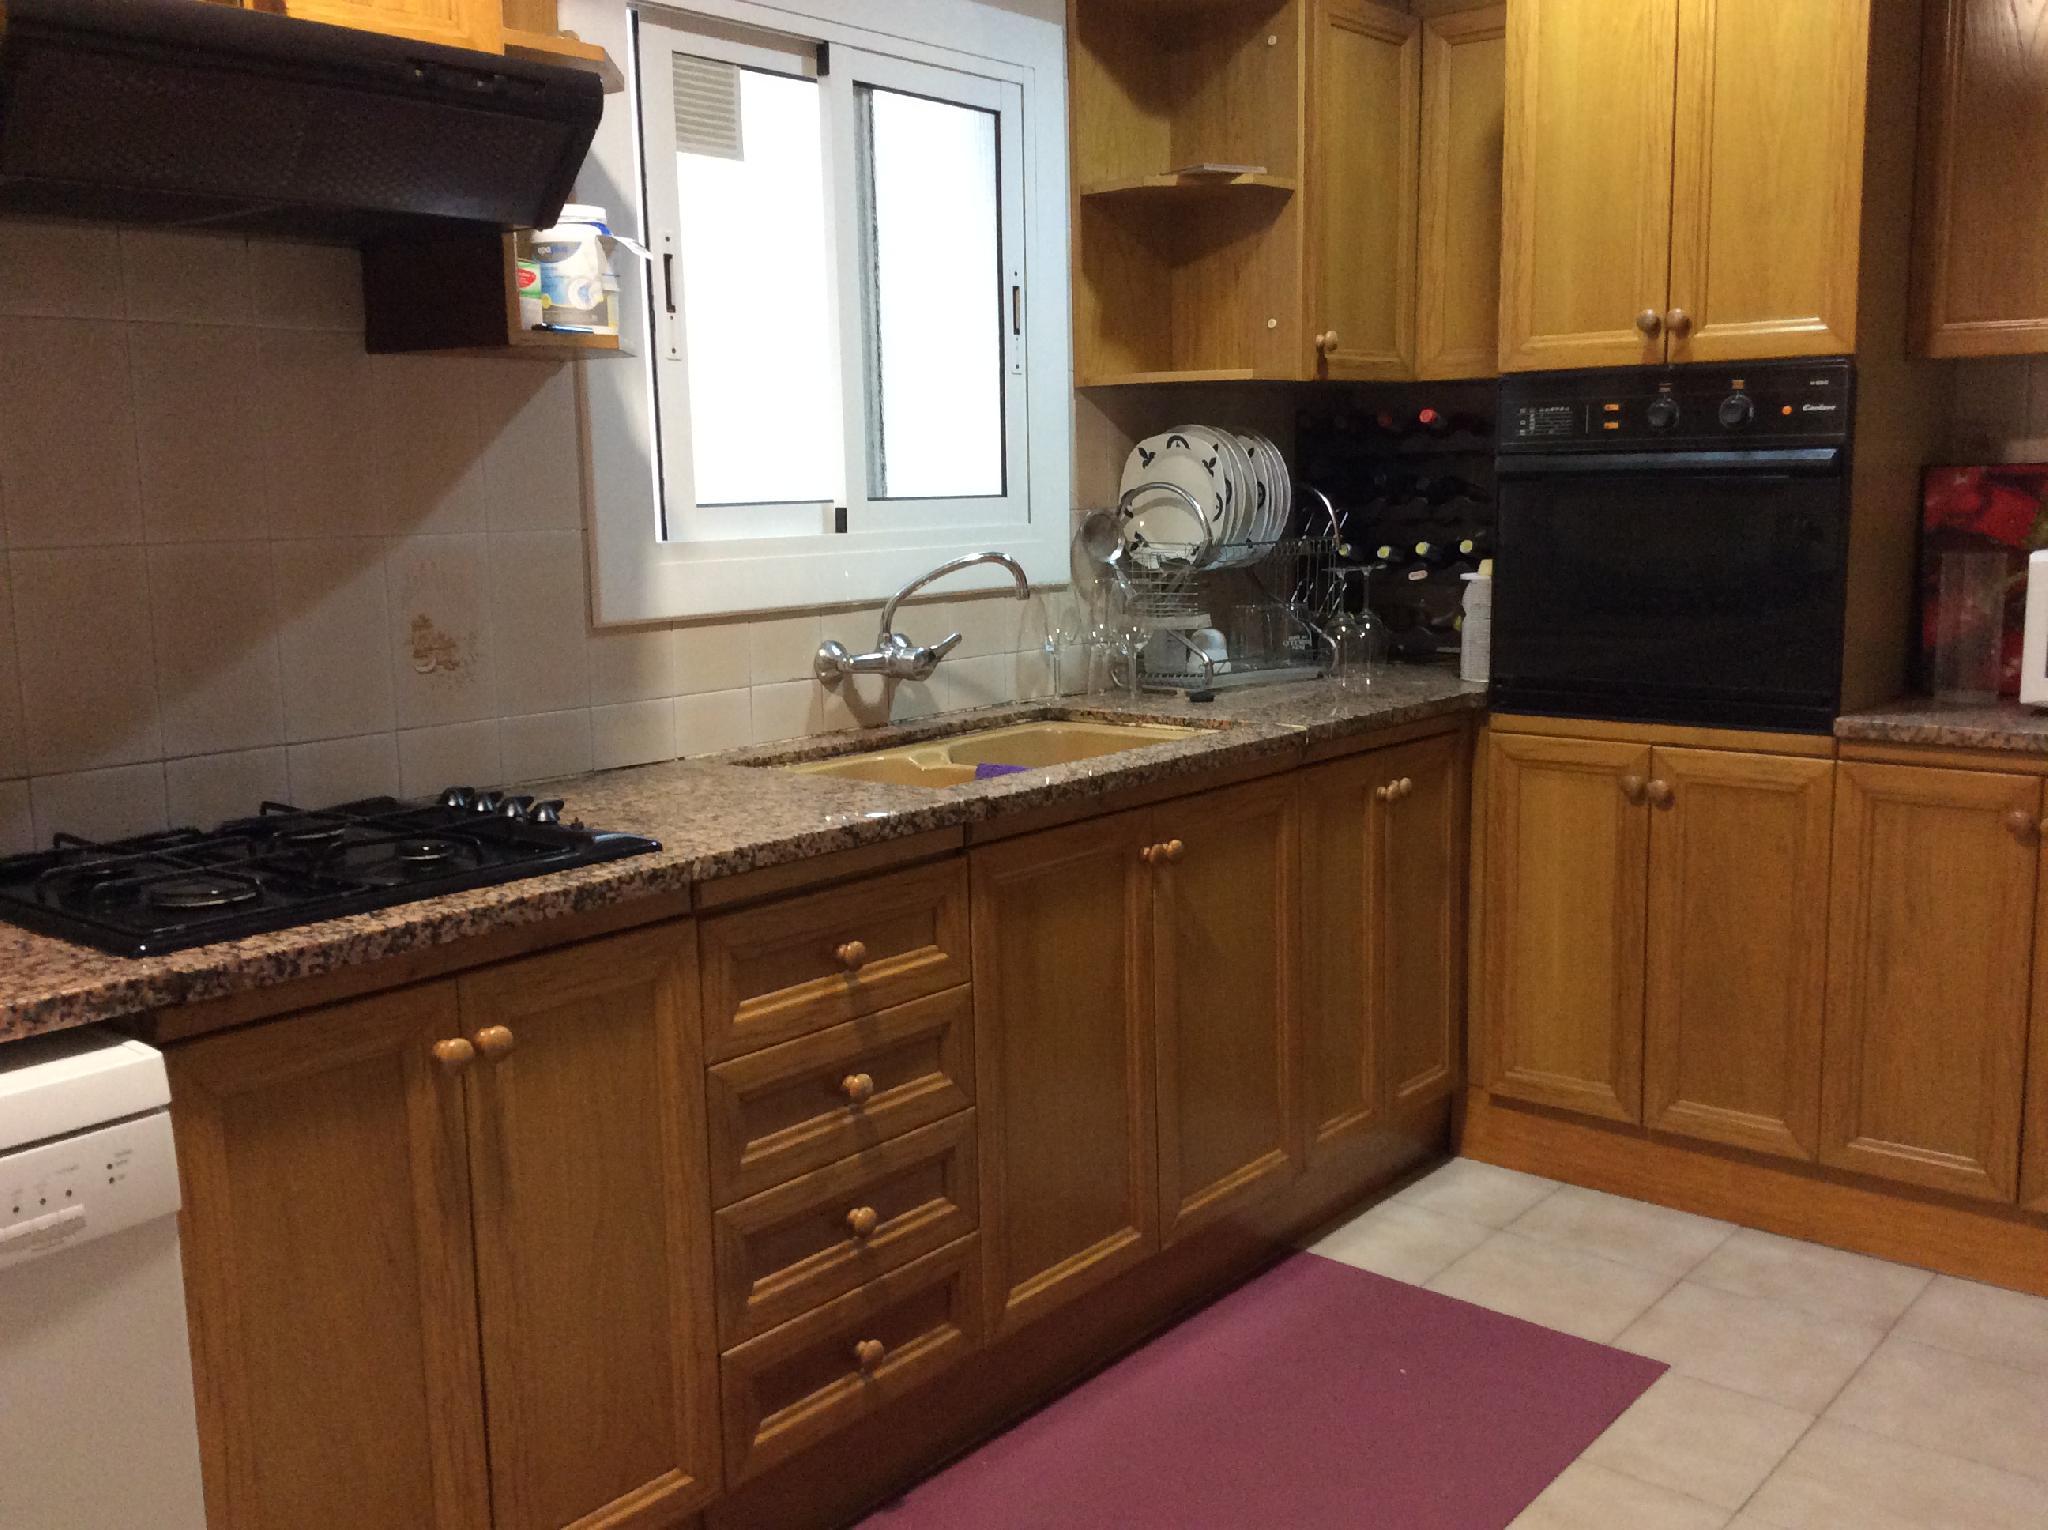 petit-appartement-de-vente-a-calle-murcia-con-espronceda-navas-a-barcelona-205880775